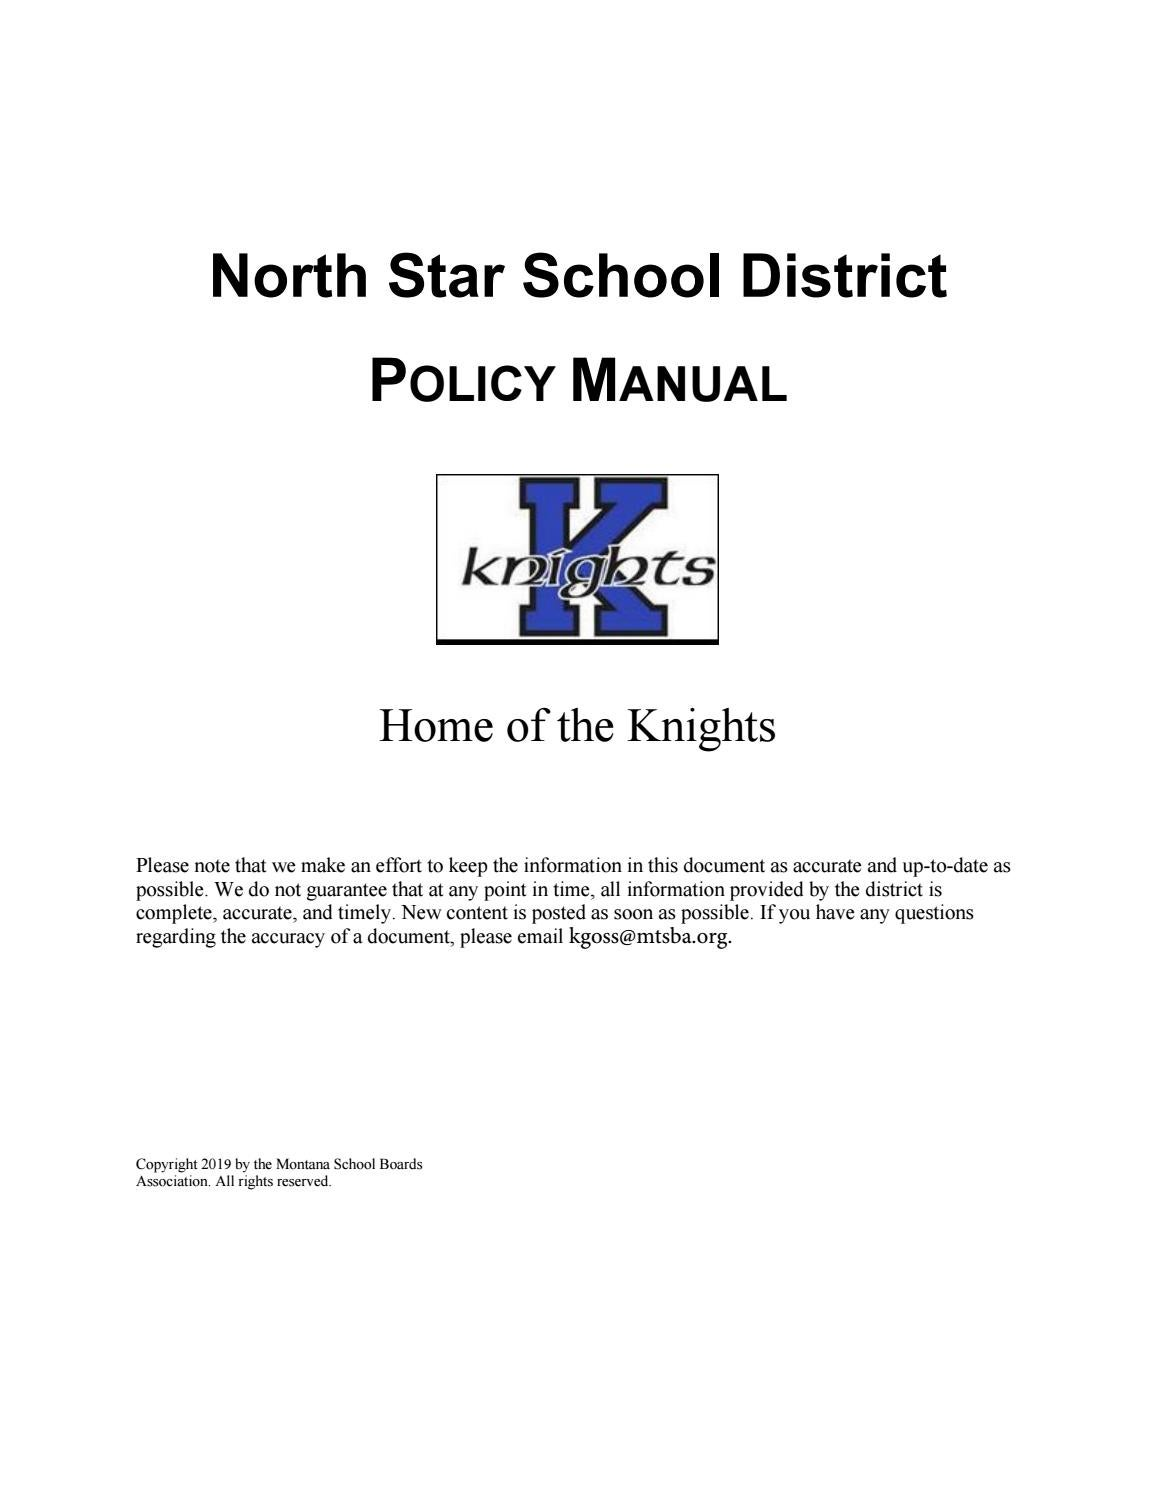 North Star Public Schools Policy Manual by Montana School